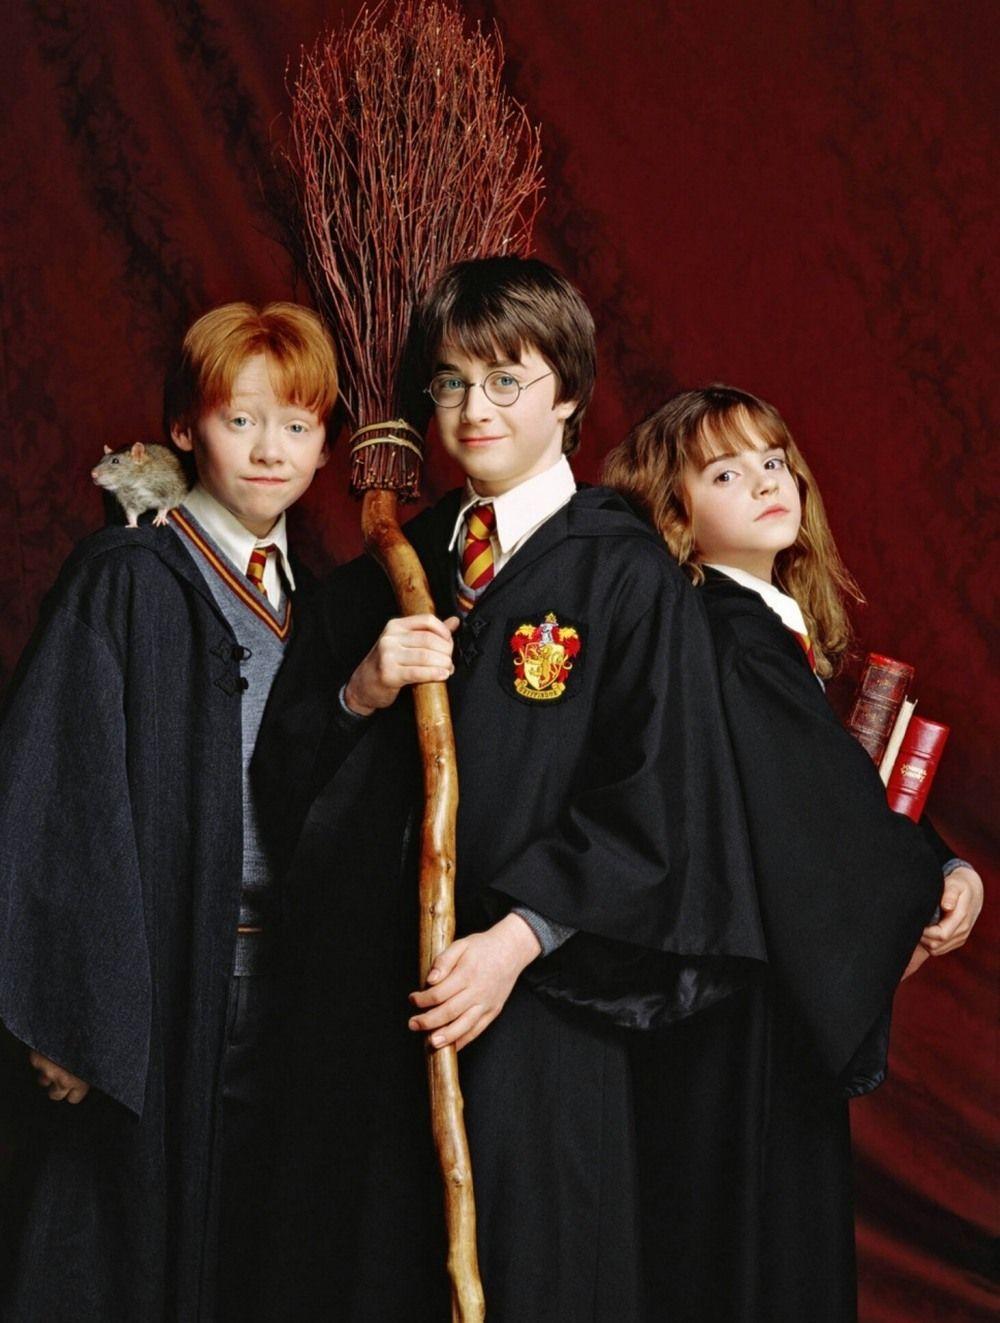 Dzhoan Rouling O Zhizni Tvorchestve I Biznese Harry Potter Cast Harry Potter Fanlari Harry Potter Filmleri